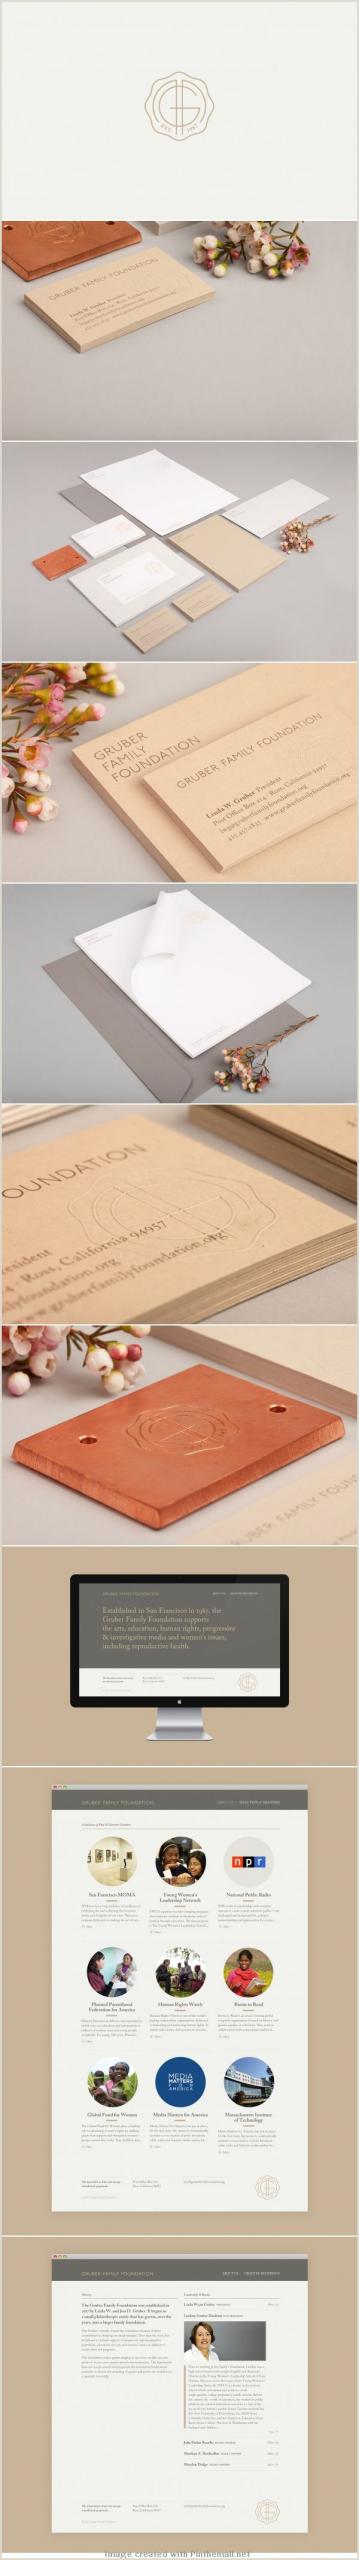 Best Business Cards Finish 14 Popular Hardwood Flooring Business Card Template